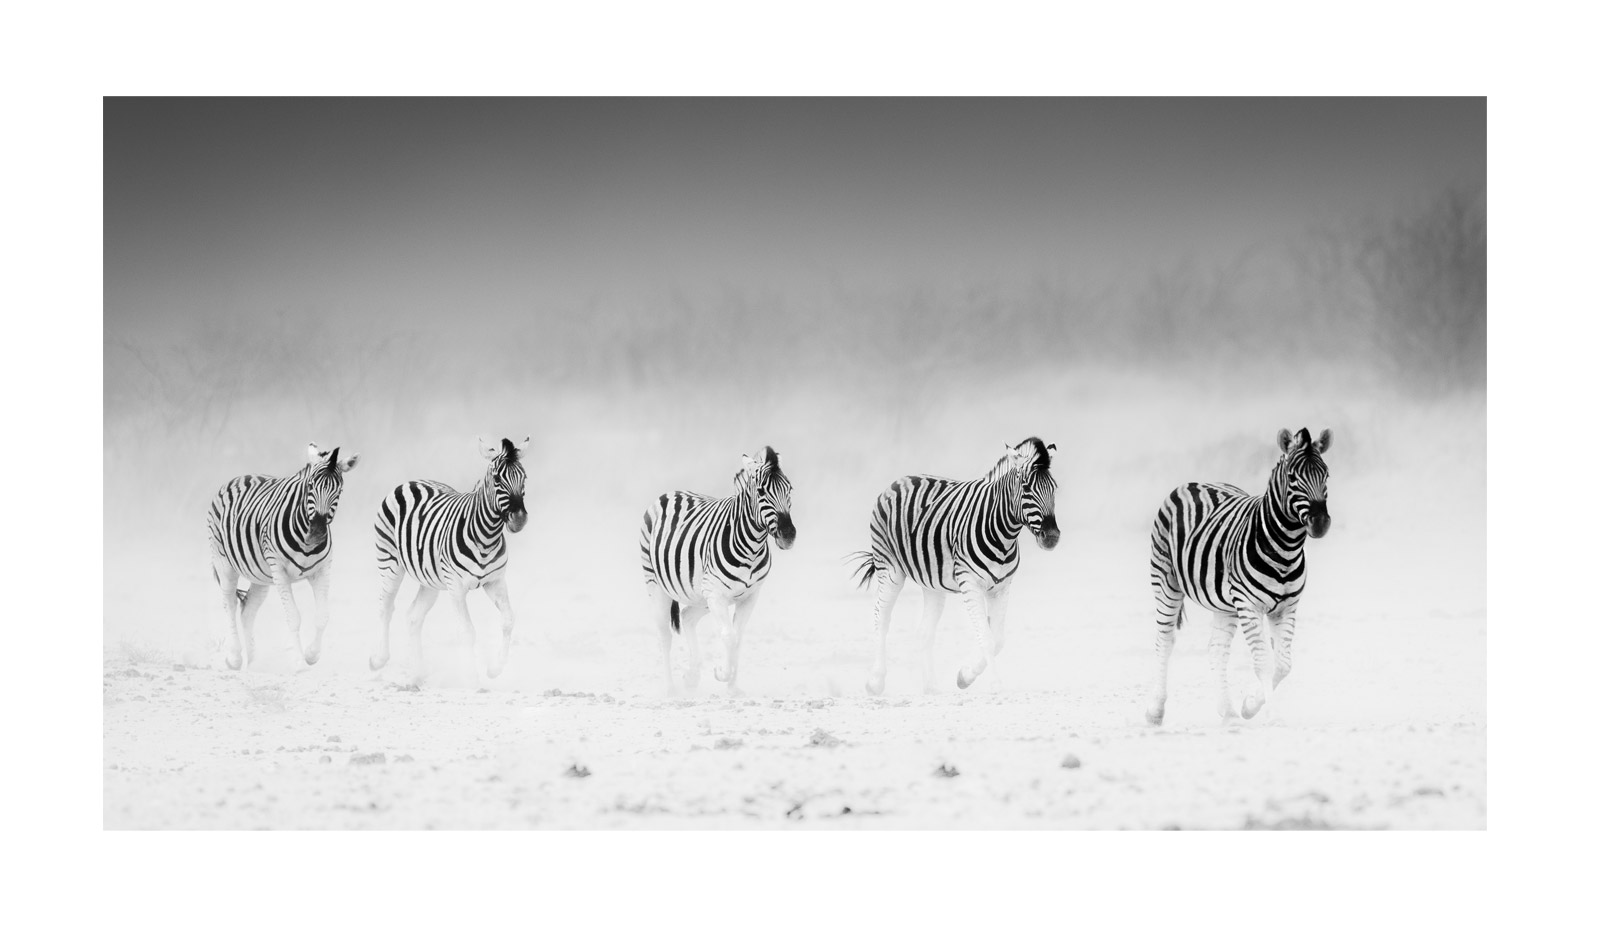 Corlette-Wessels-Etosha-zebra